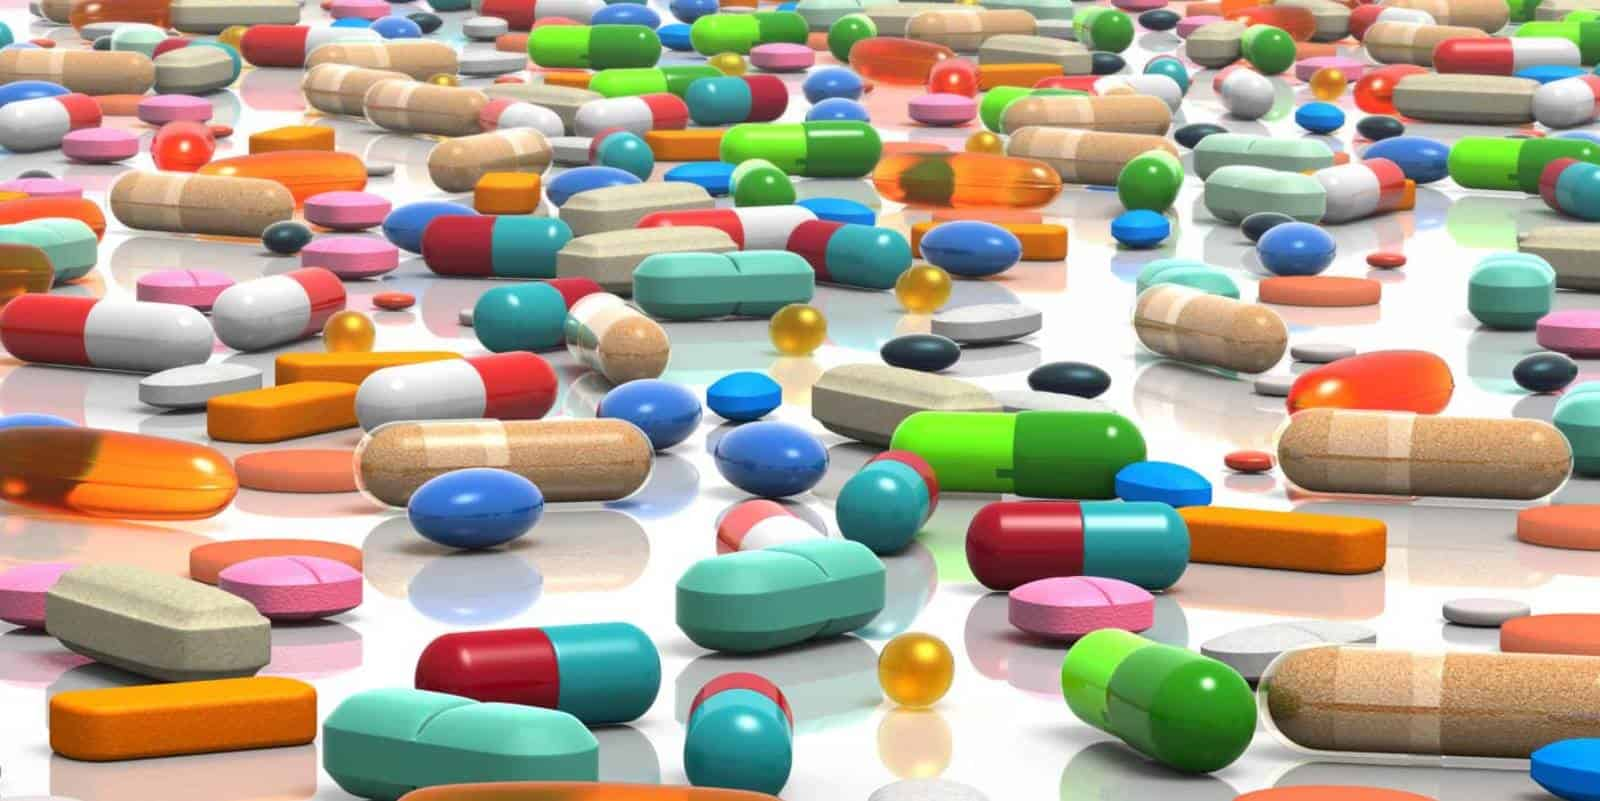 Pharmaceuticals – corrupt industry